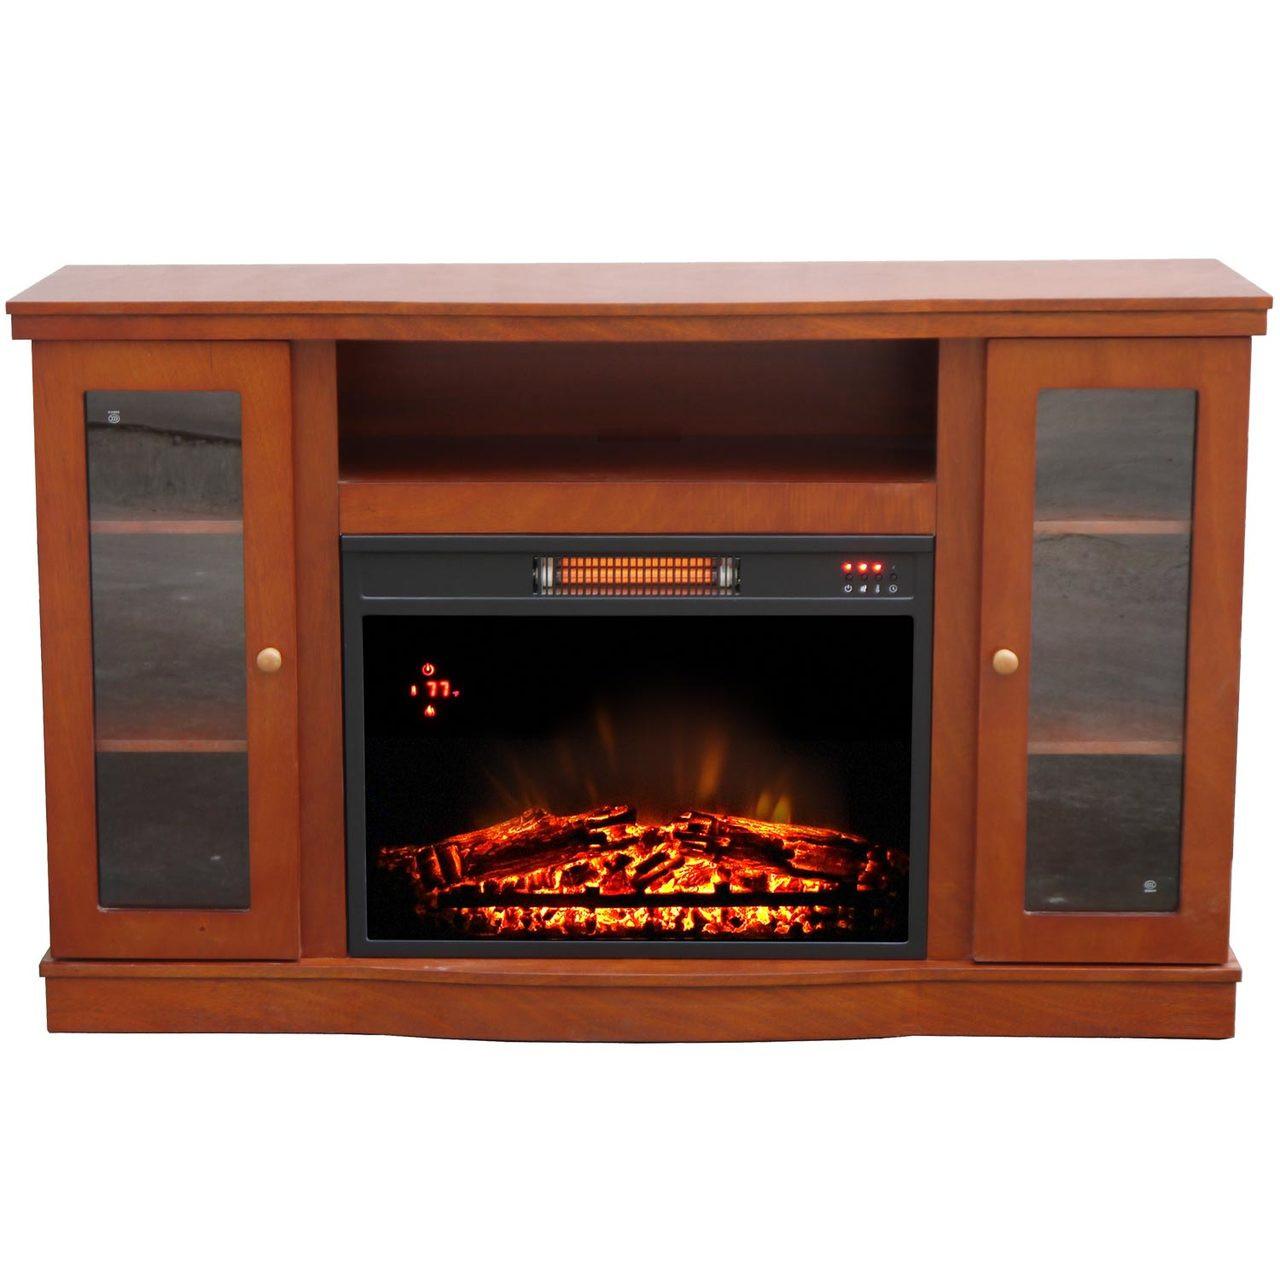 comfort glow qef7530rkd abington media center with infrared quartz